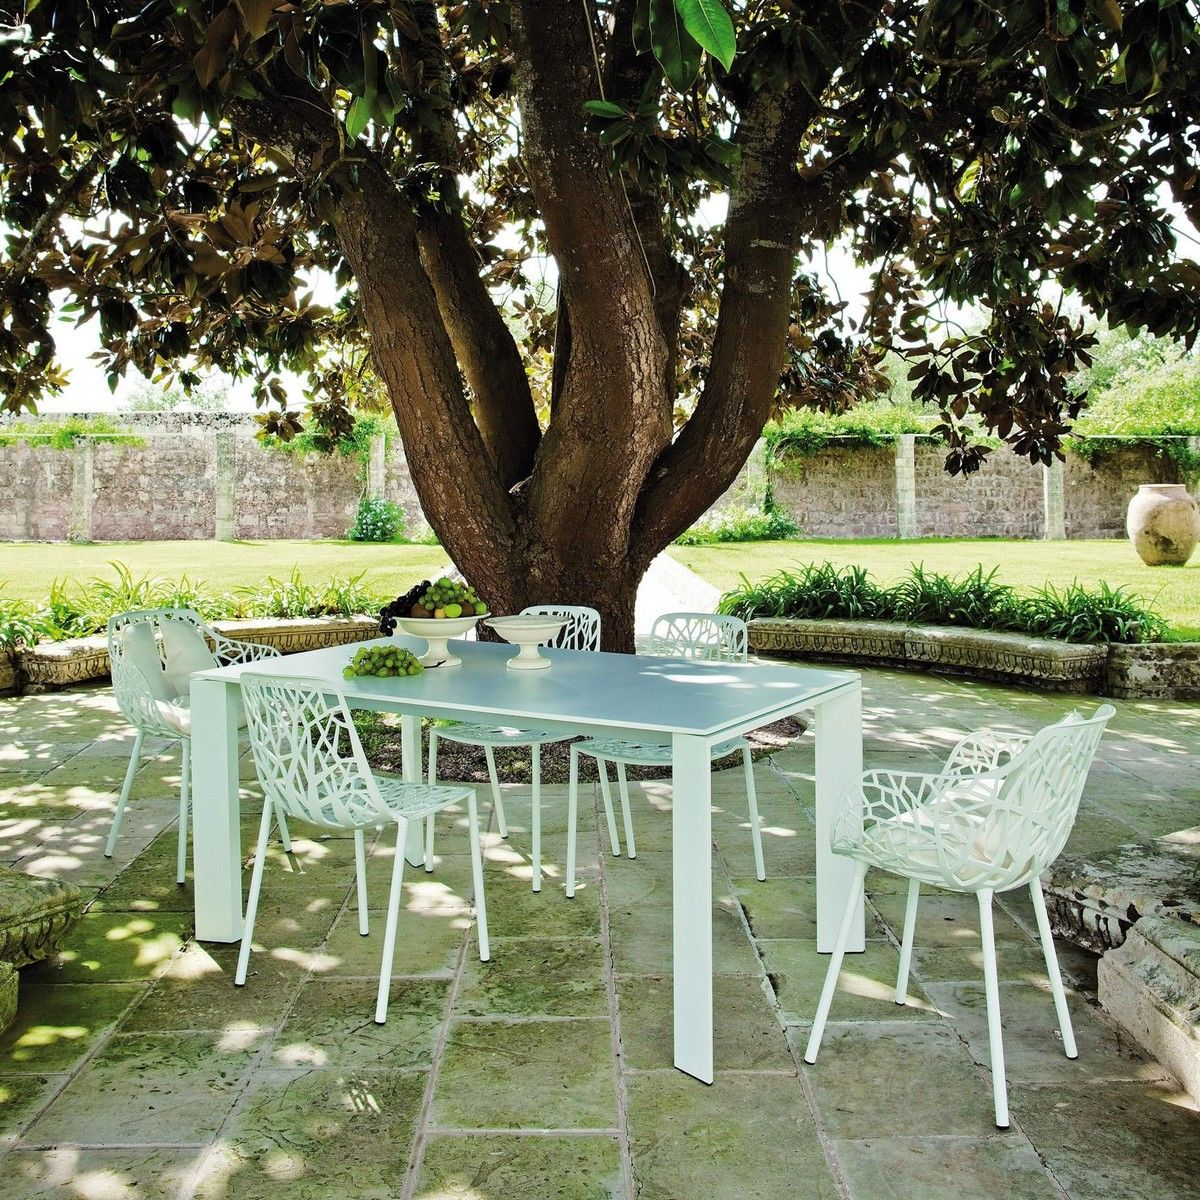 grande arche table de jardin rallonges weish upl. Black Bedroom Furniture Sets. Home Design Ideas